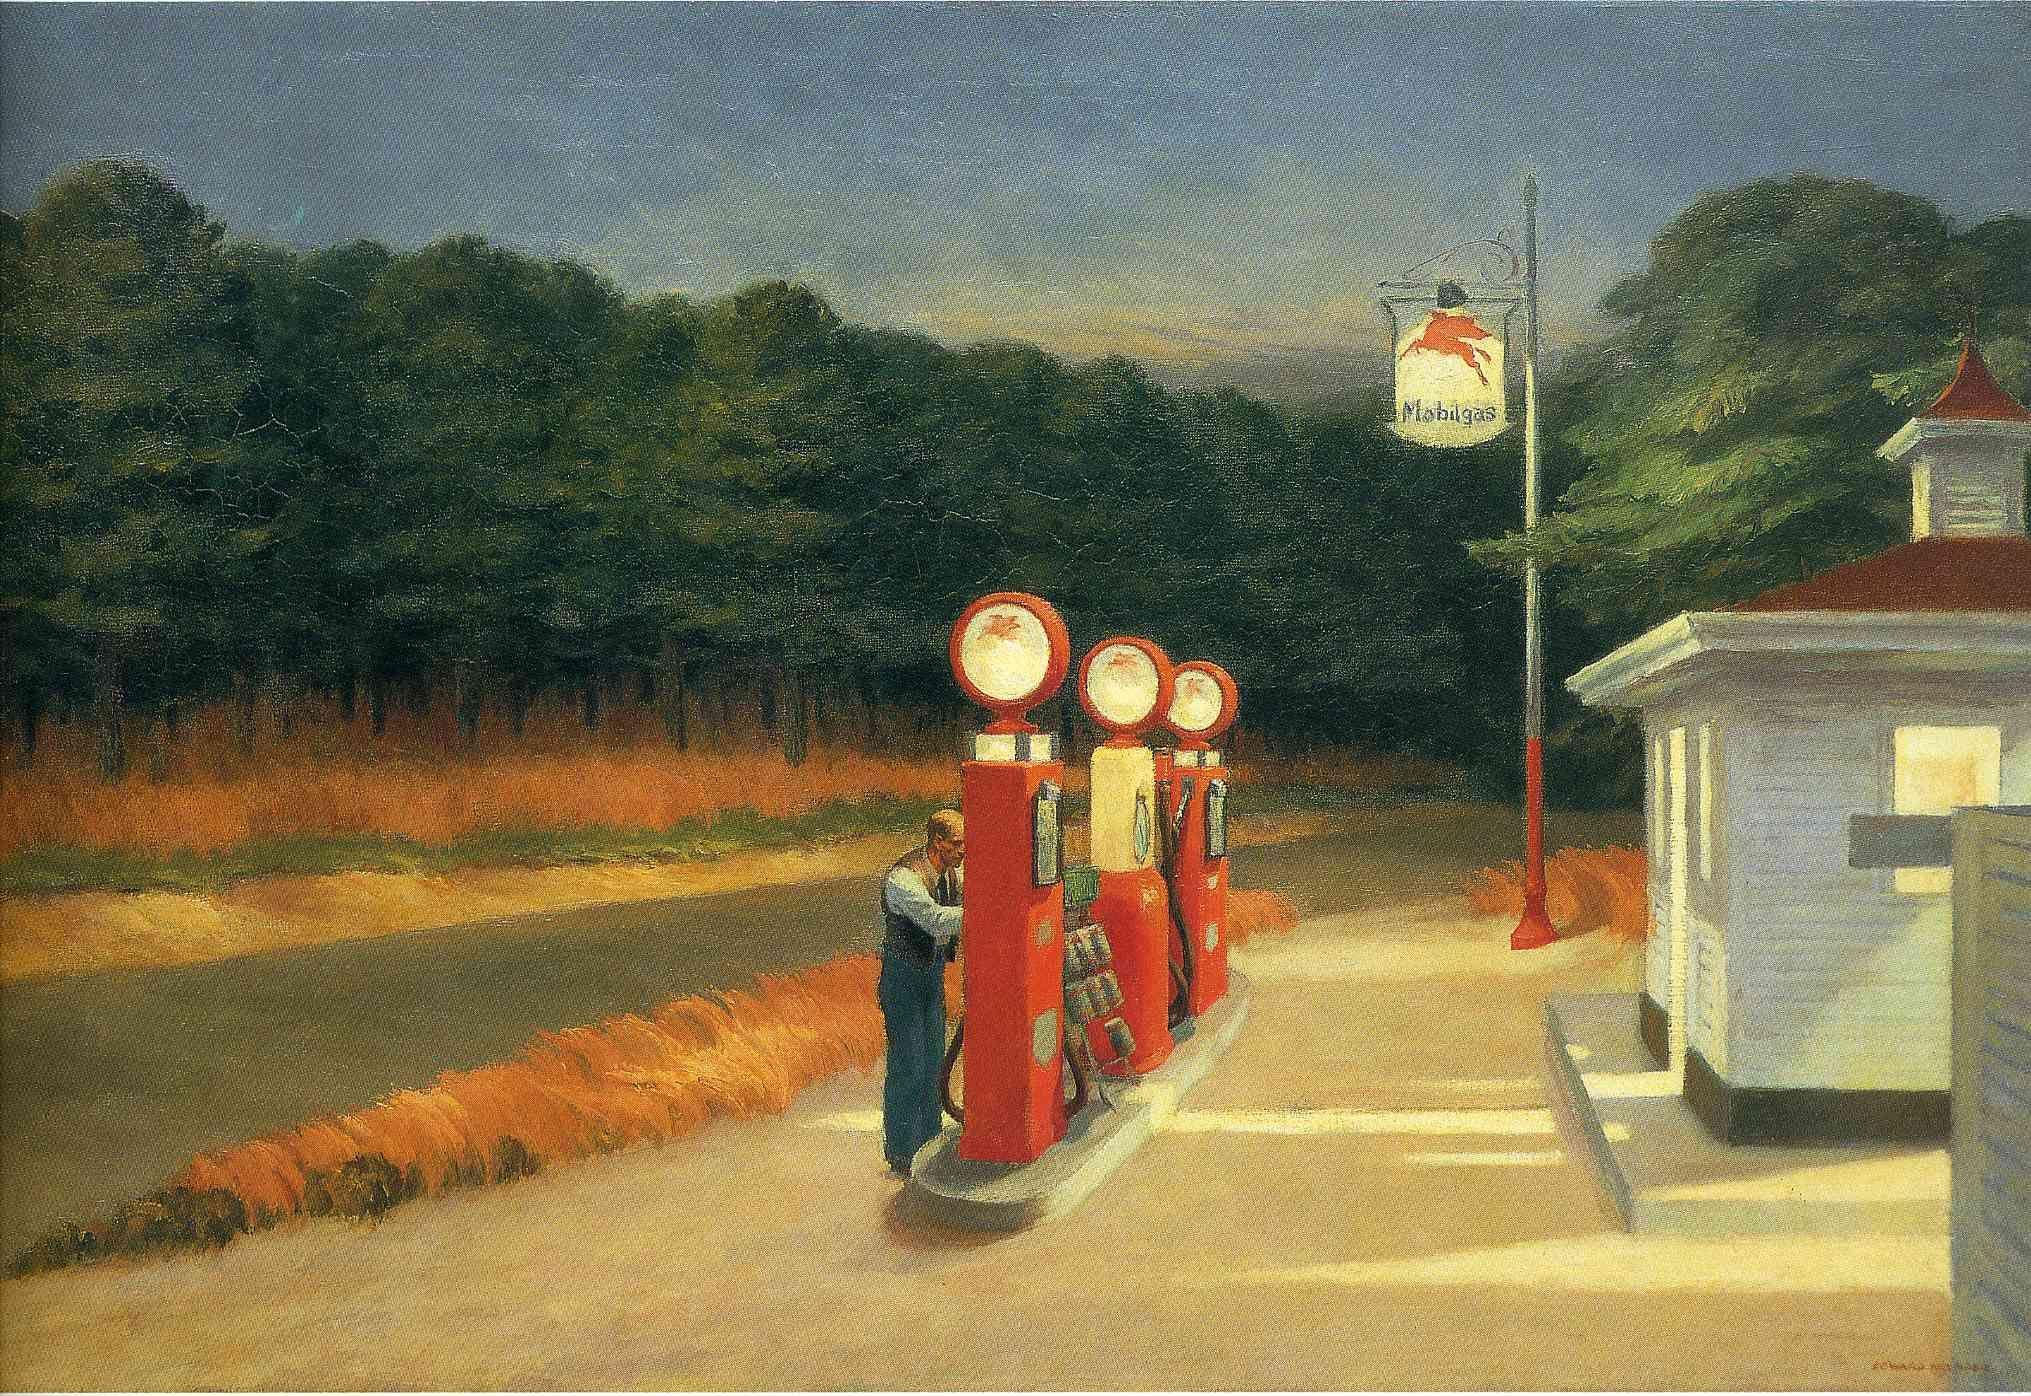 Edward Hopper - Gas, 1940, oil on canvas